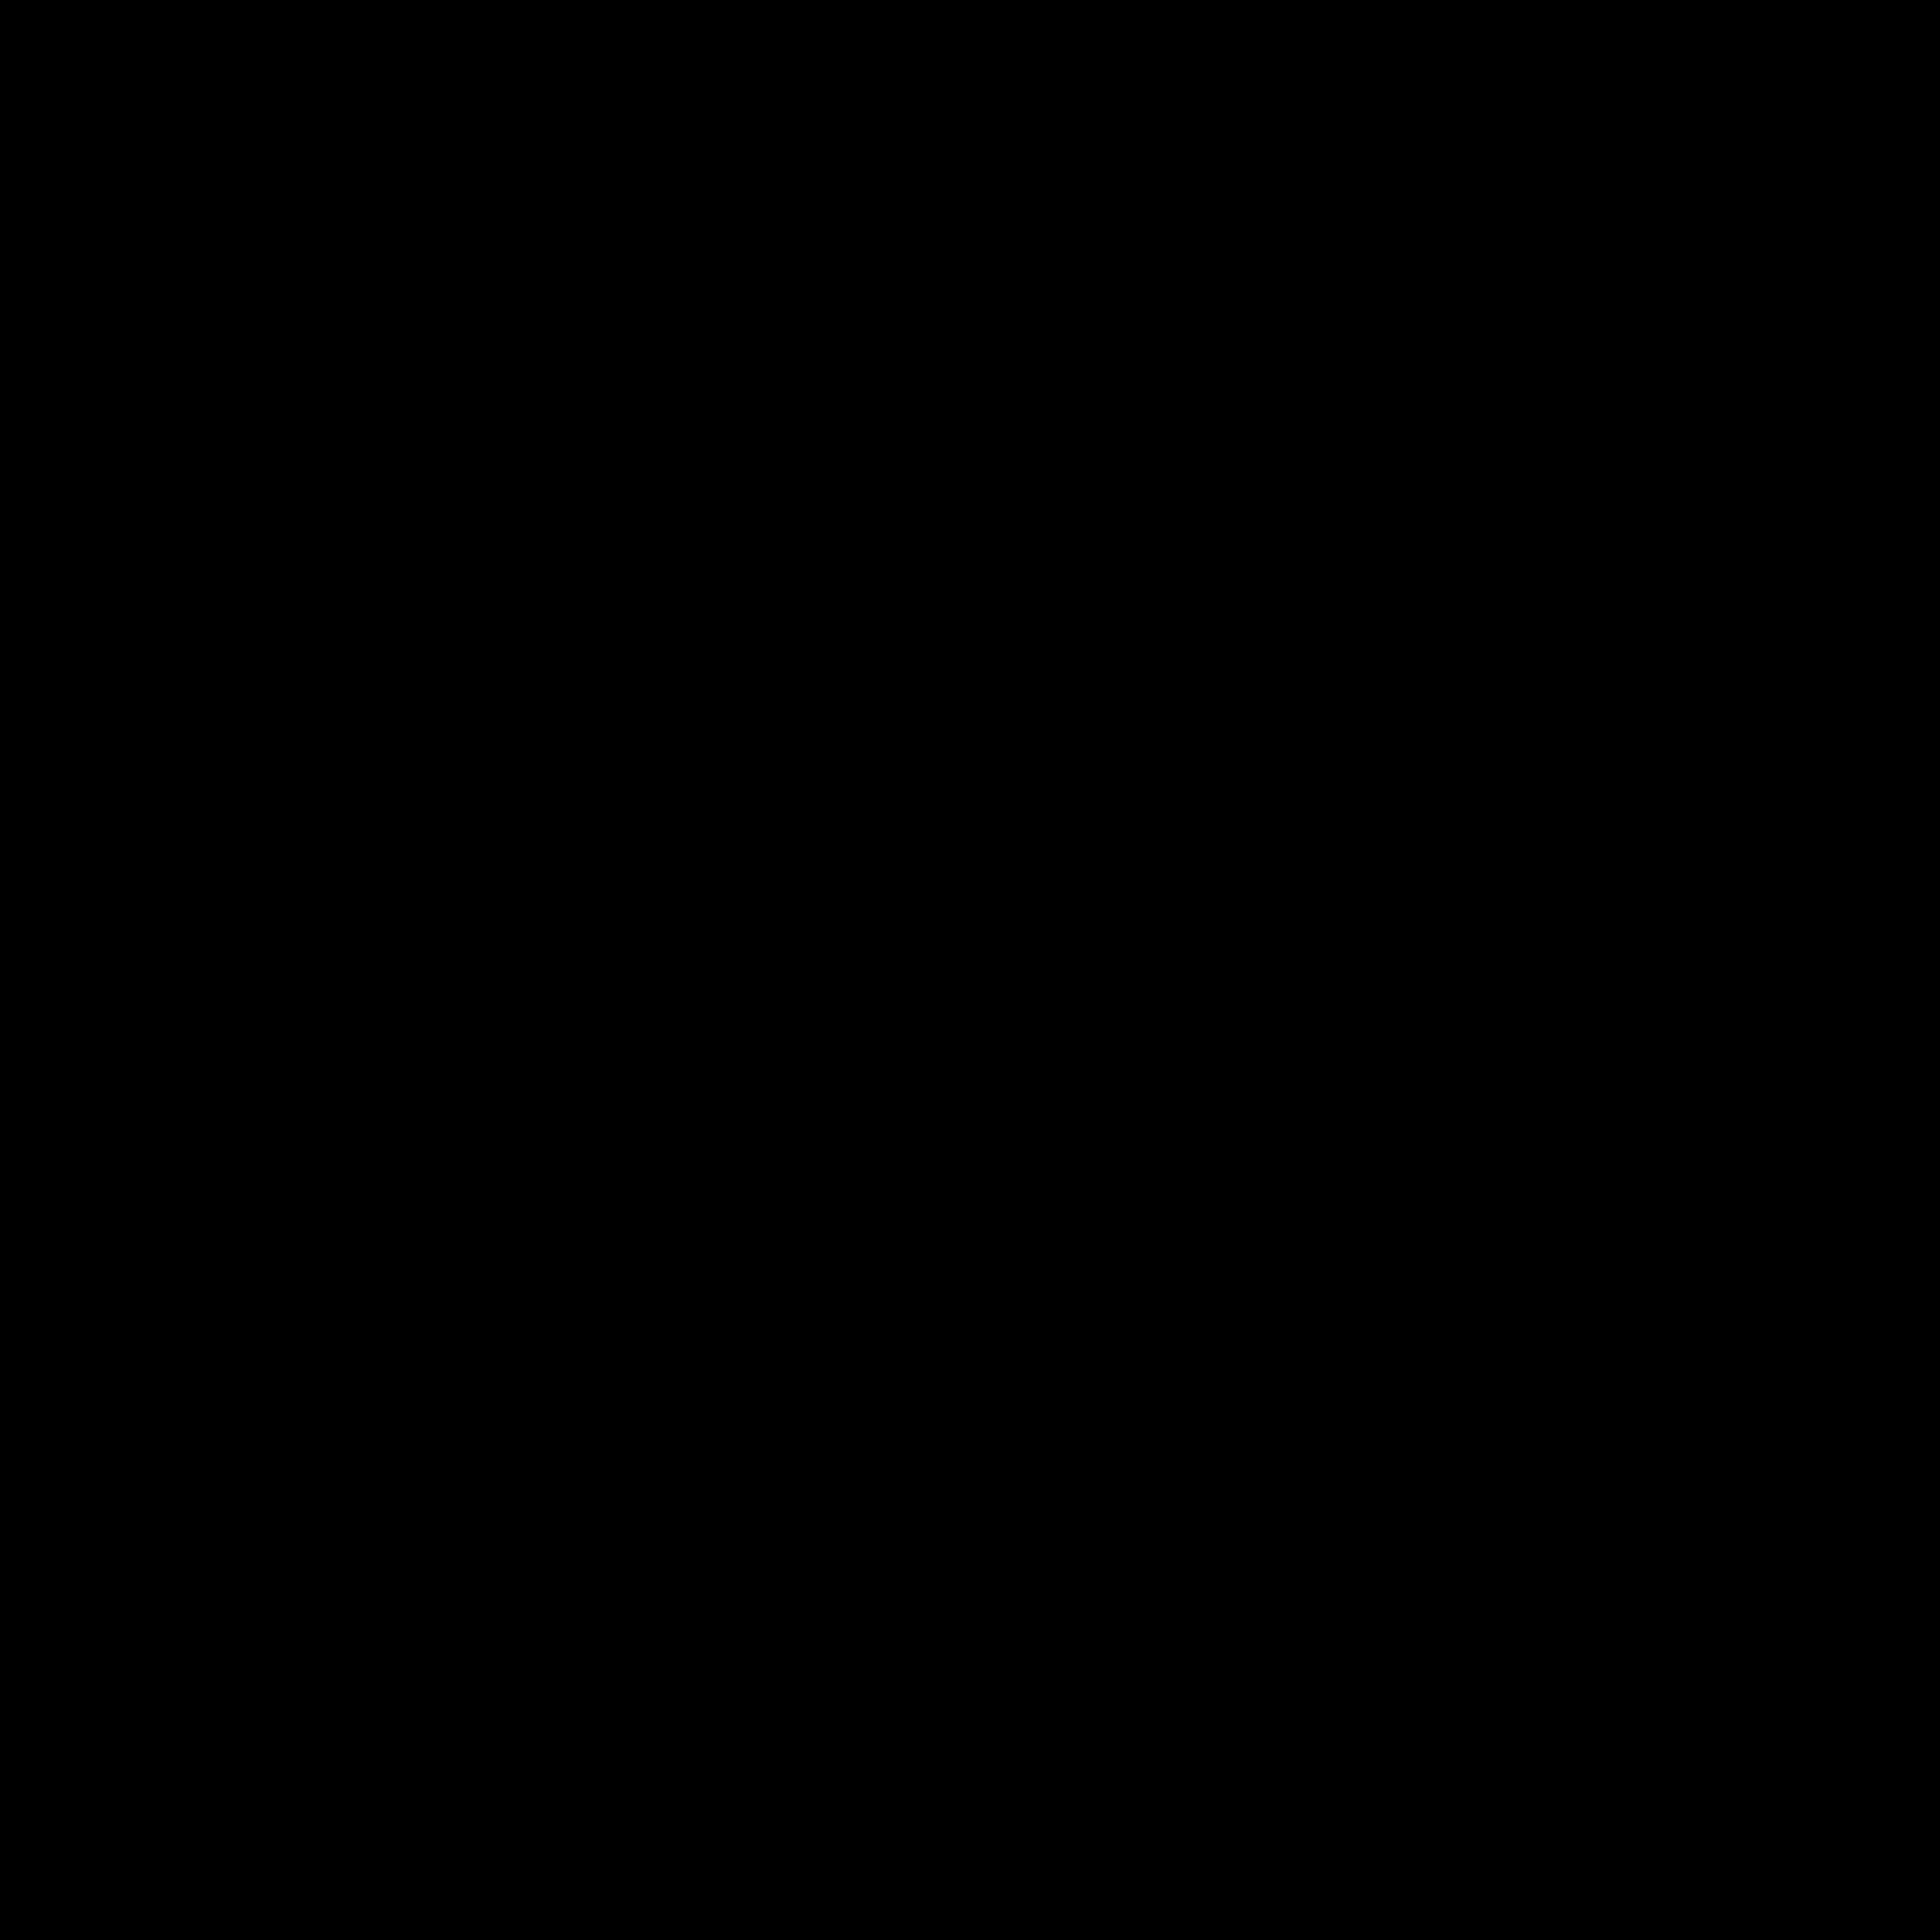 Boucheron Logo PNG Transparent & SVG Vector.